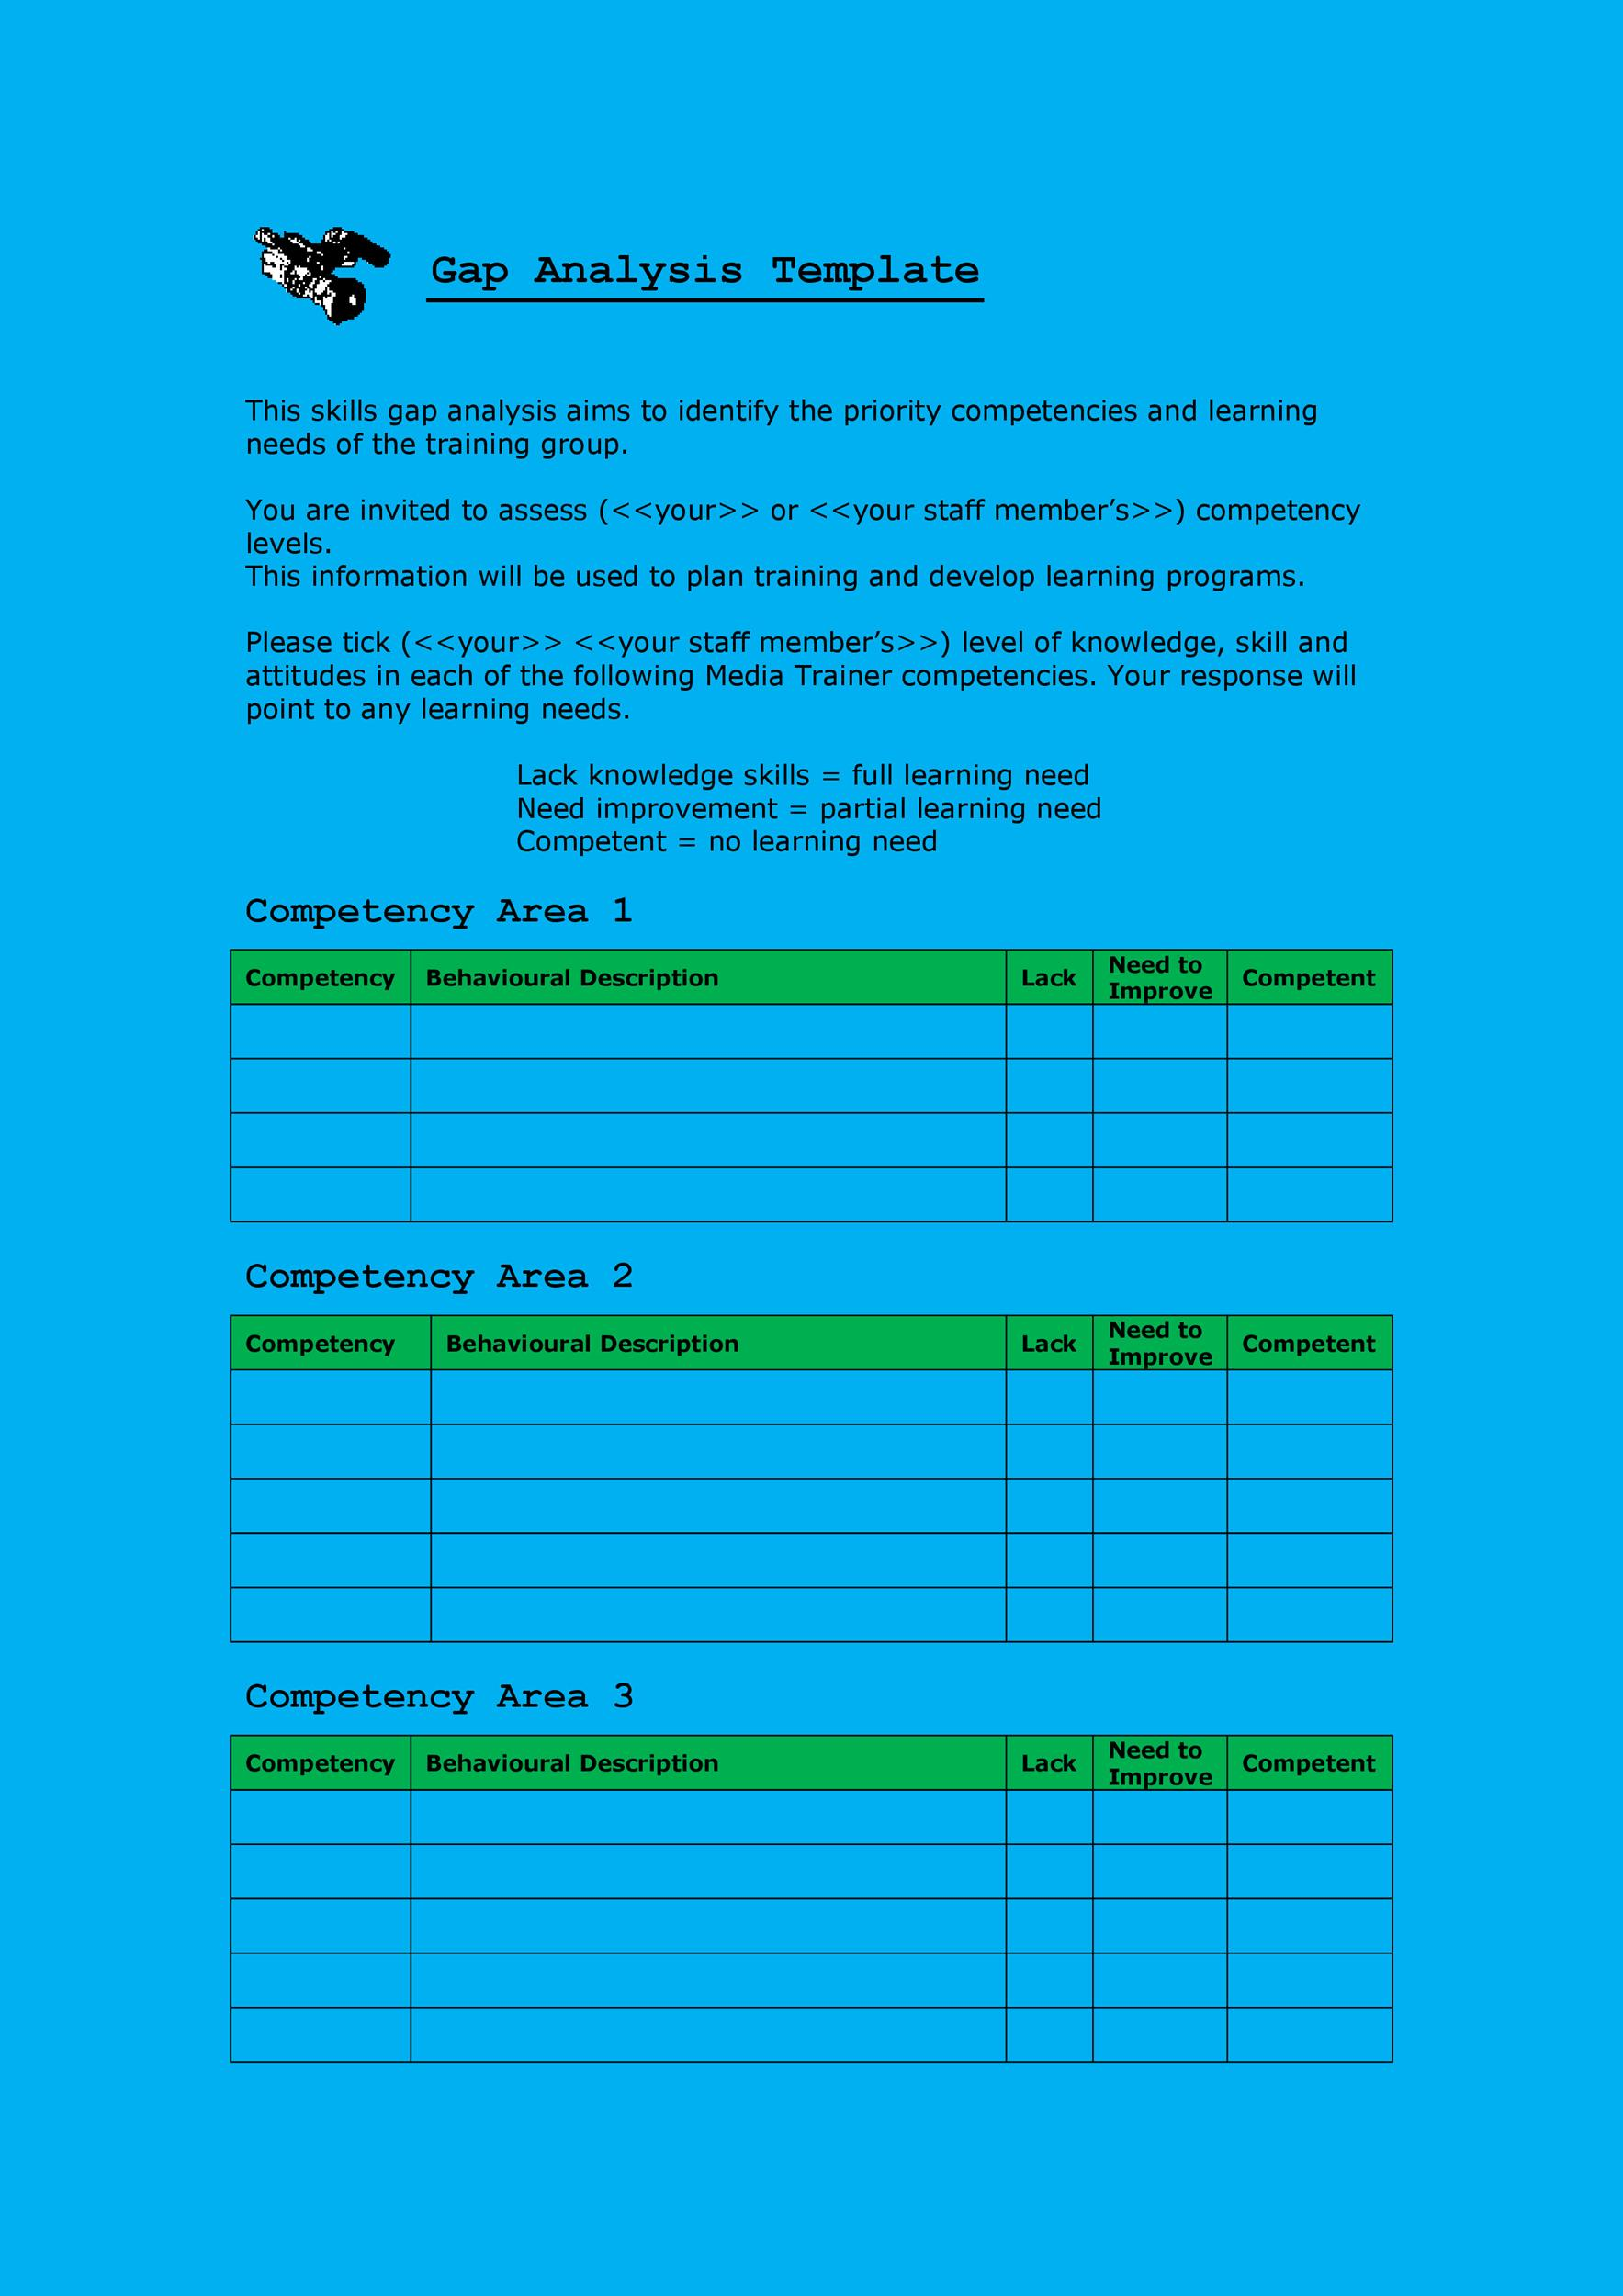 40 Gap Analysis Templates & Exmaples (Word, Excel, PDF)